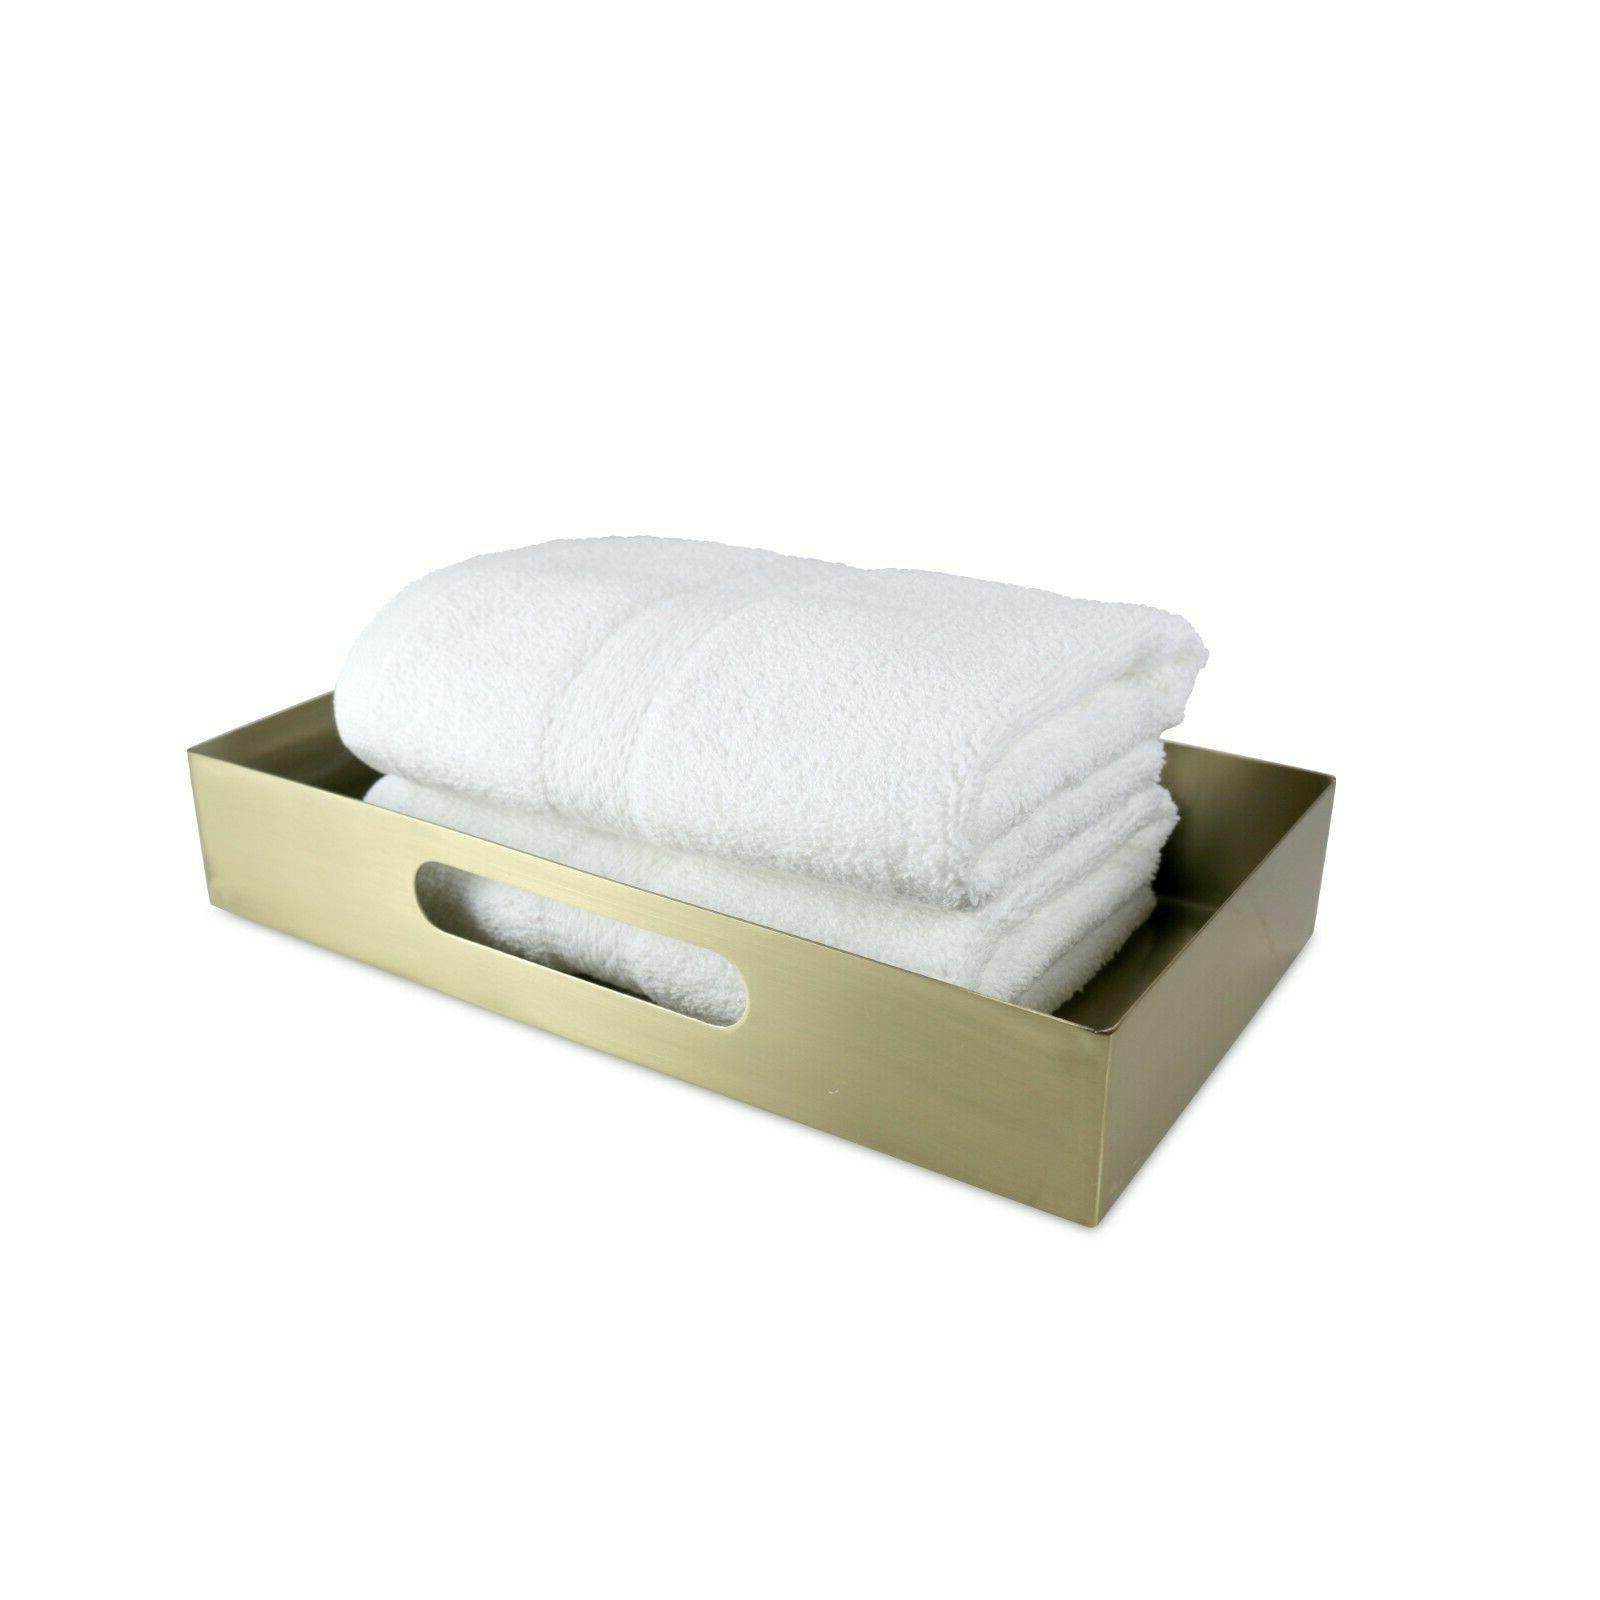 12 Pack Hand - - 16 x - Bathroom Towels